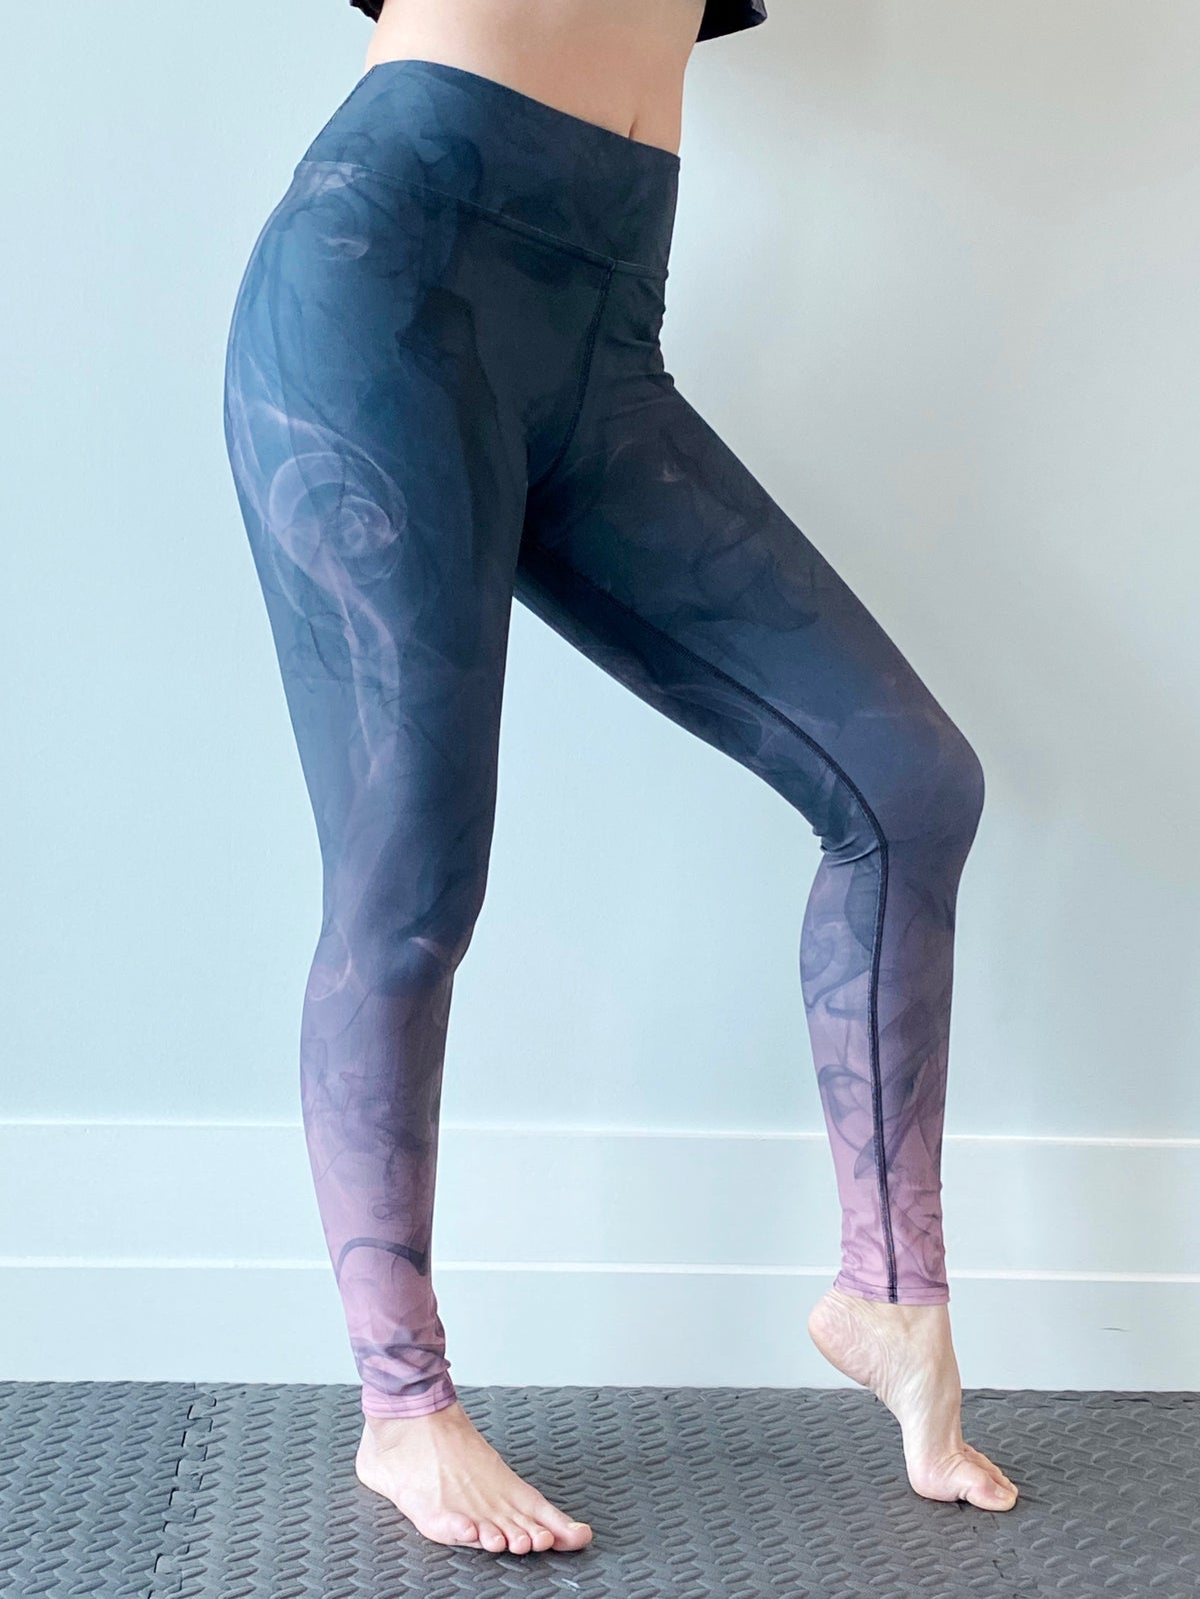 Image of Inhale / Exhale Yoga Pants